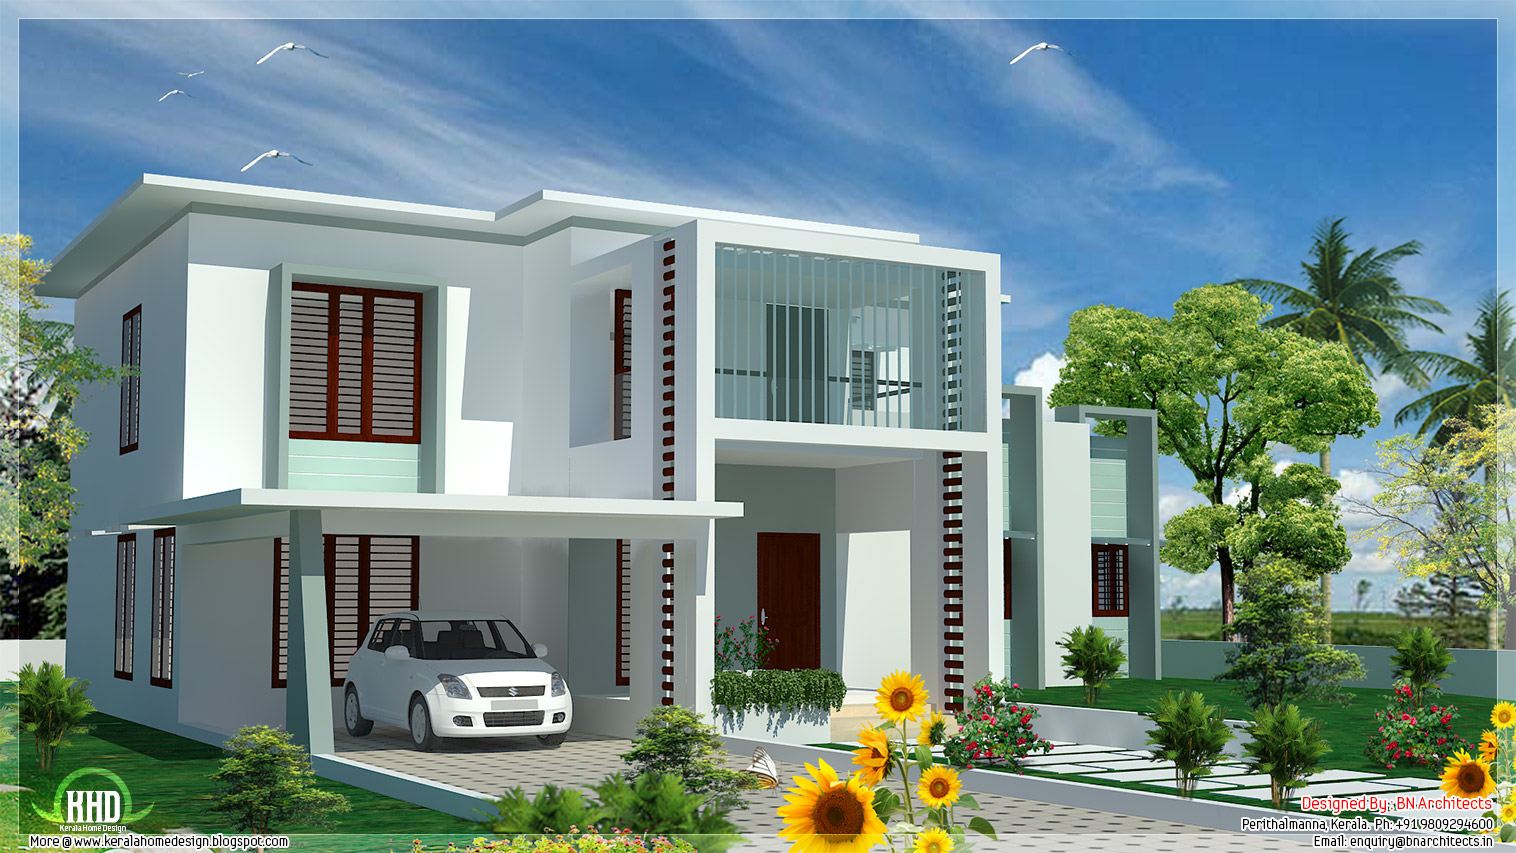 4 bedroom modern flat roof house